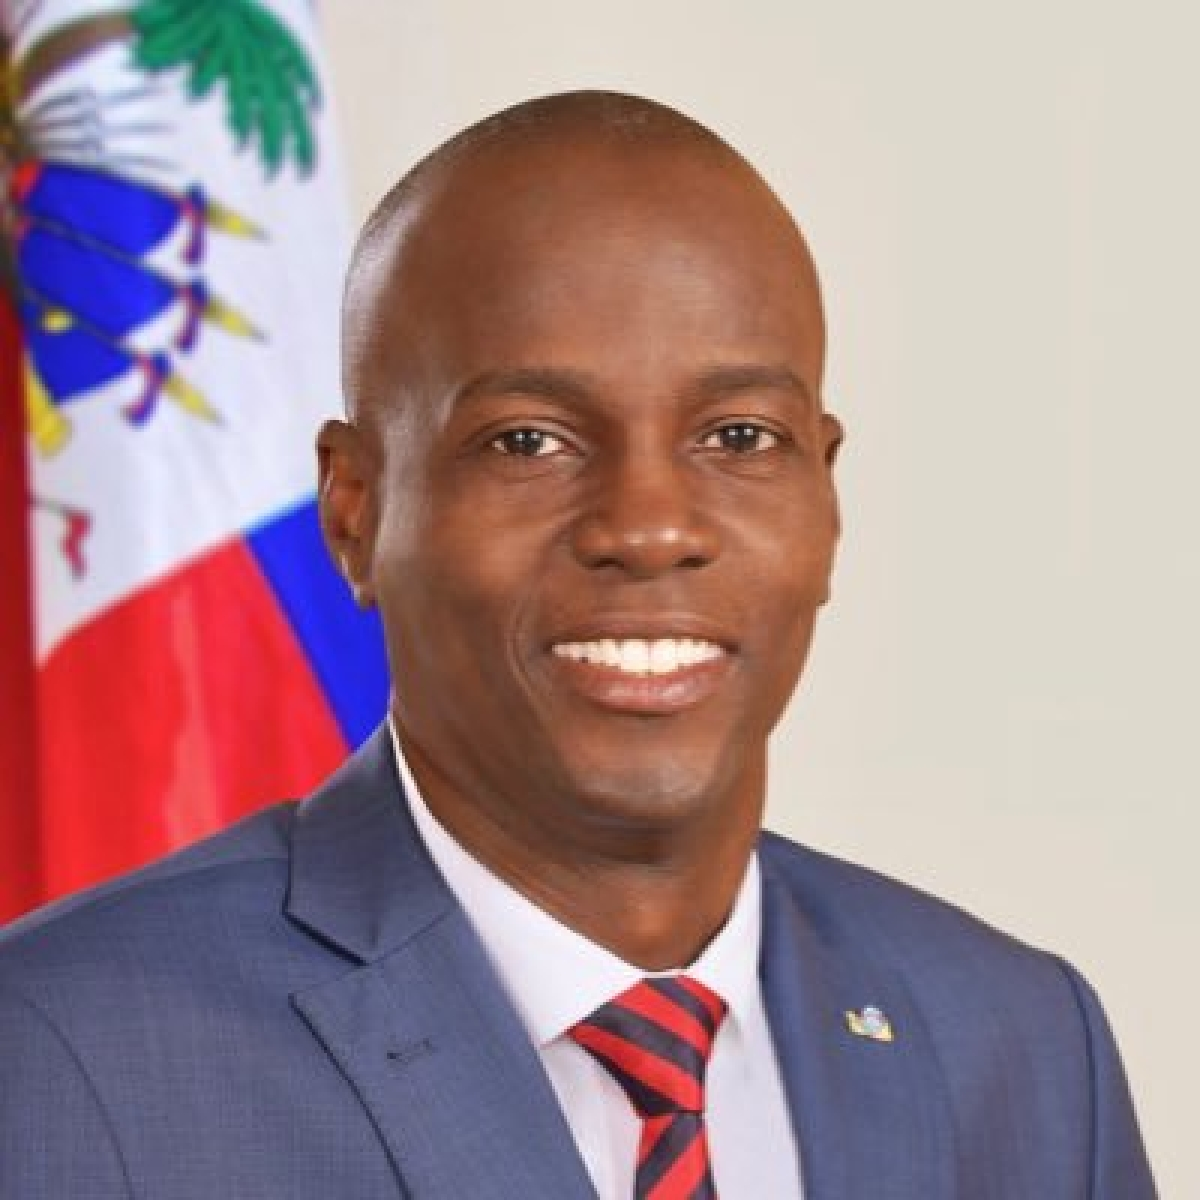 Crisis in Haiti worsens as President remains silent